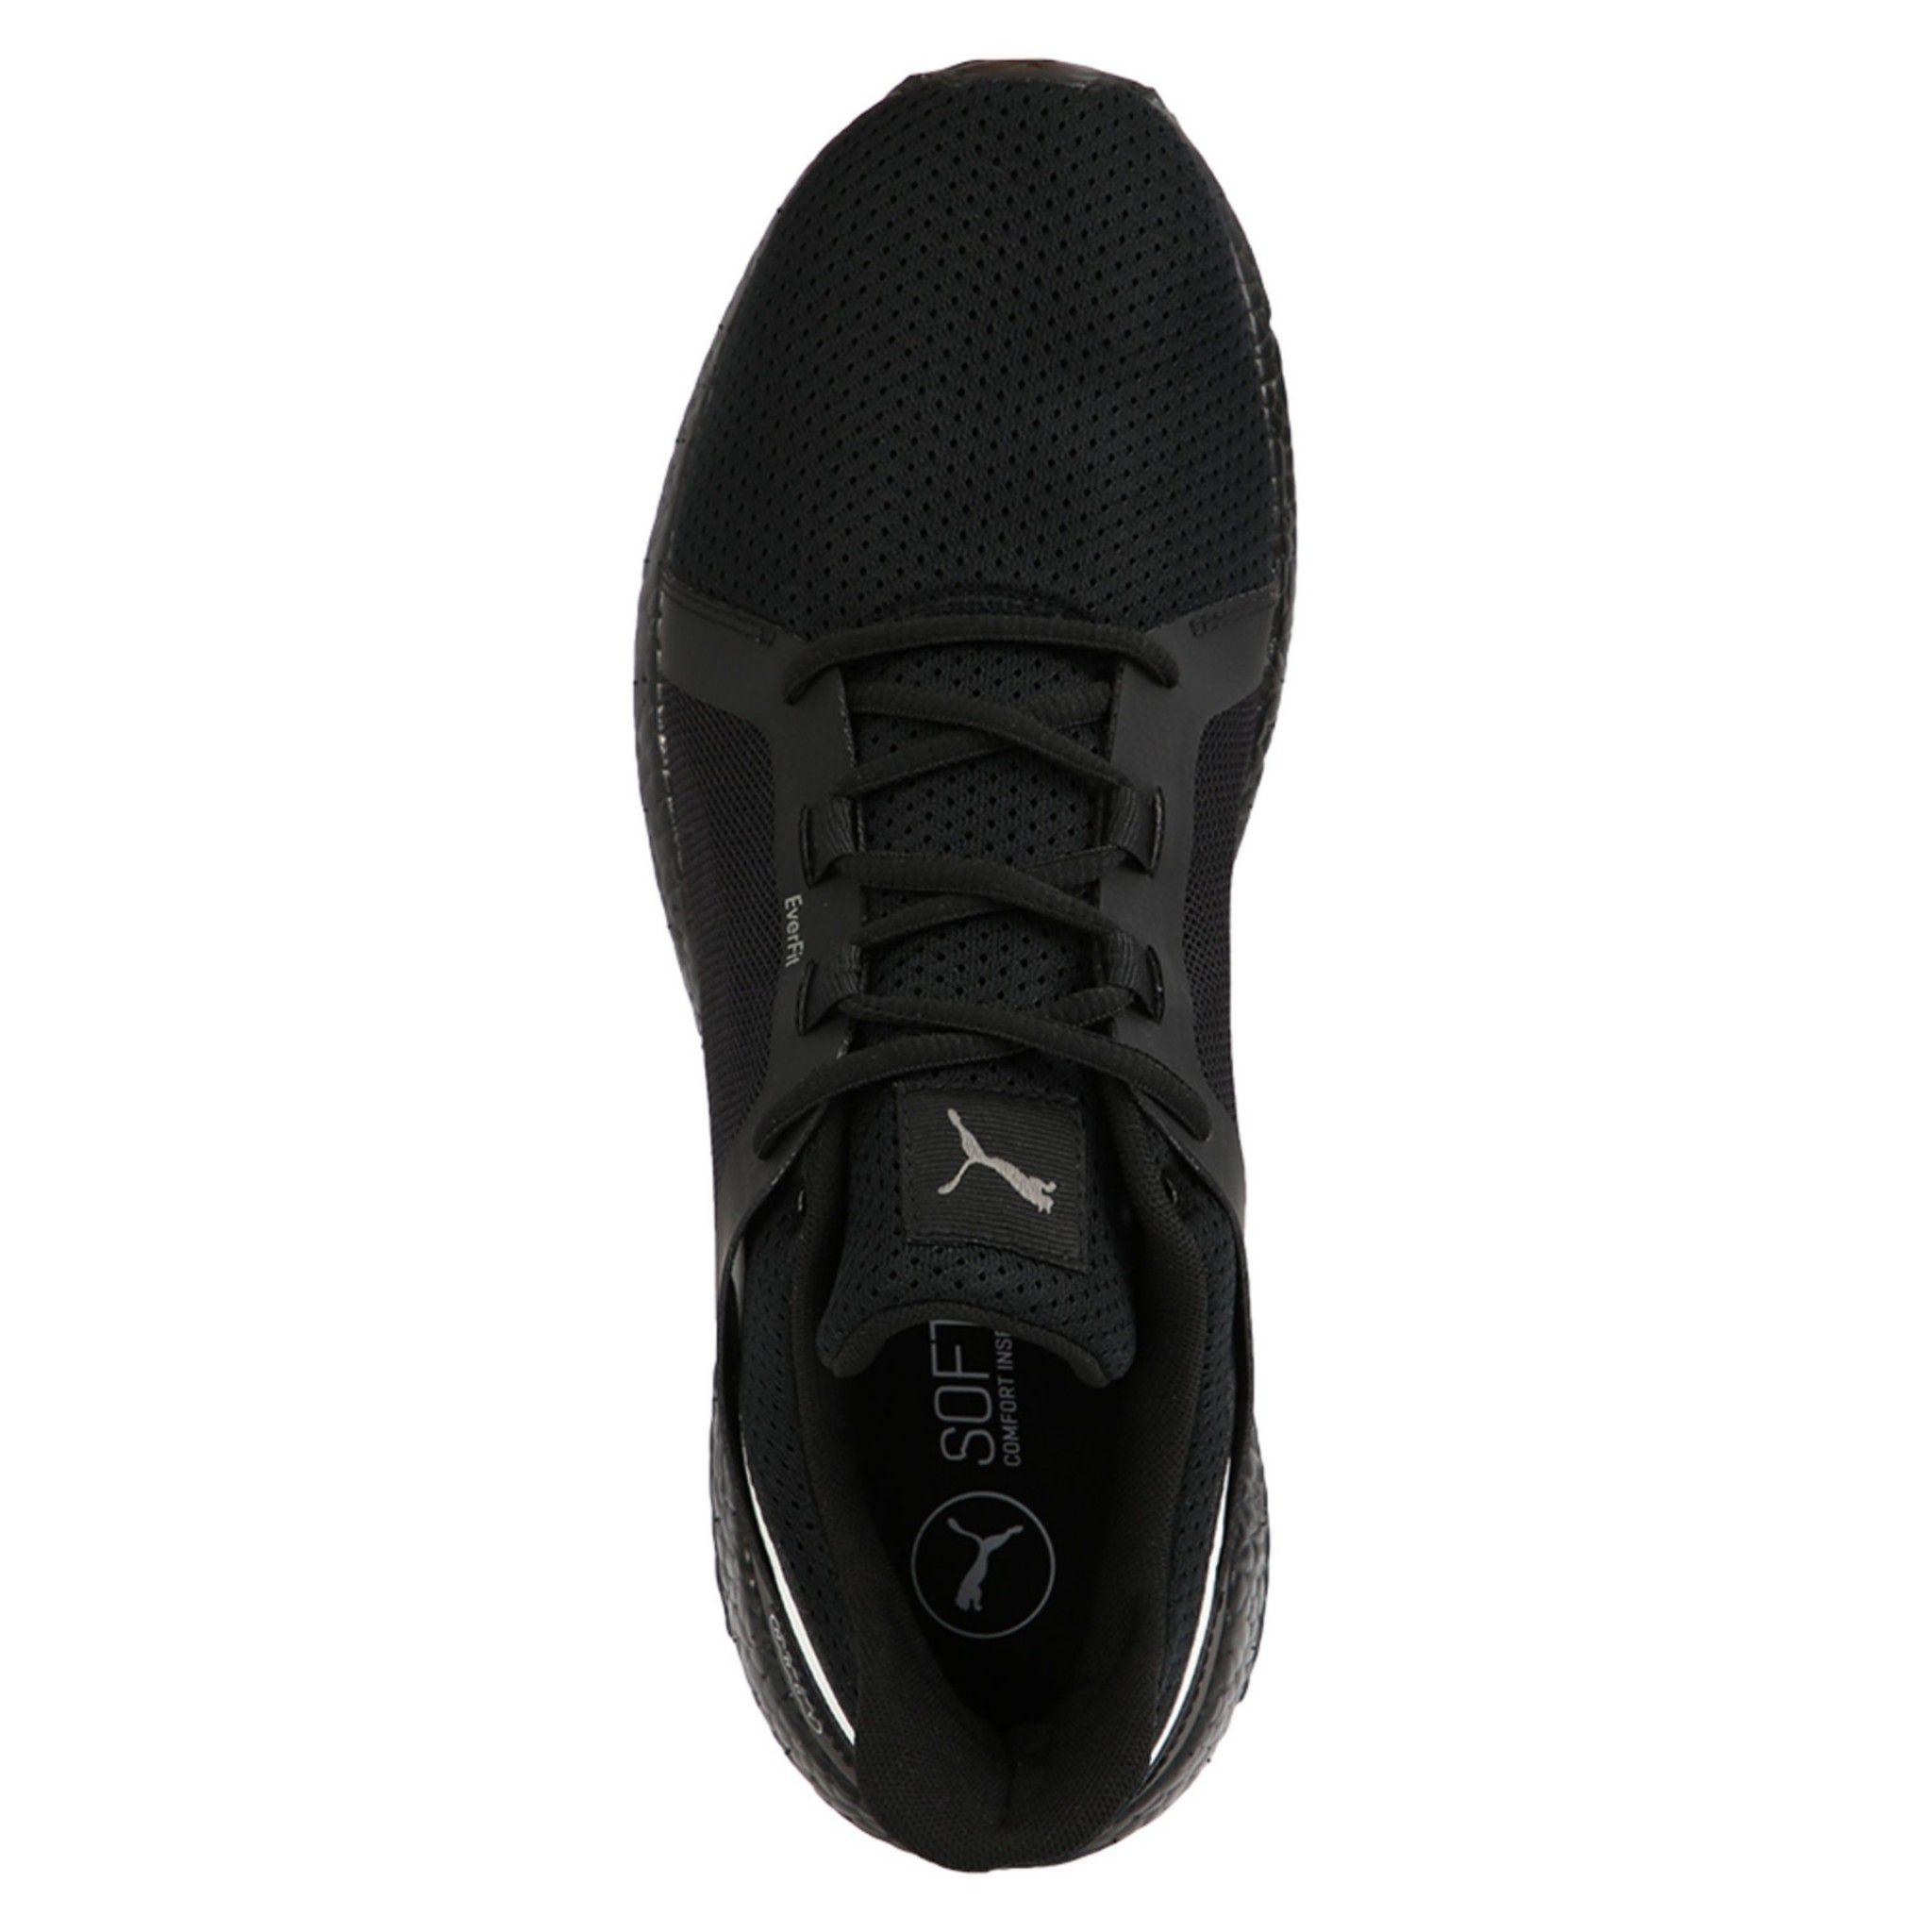 d17339807740 Puma Mega NRGY Turbo 2 Black Running Shoes - Buy Puma Mega NRGY ...